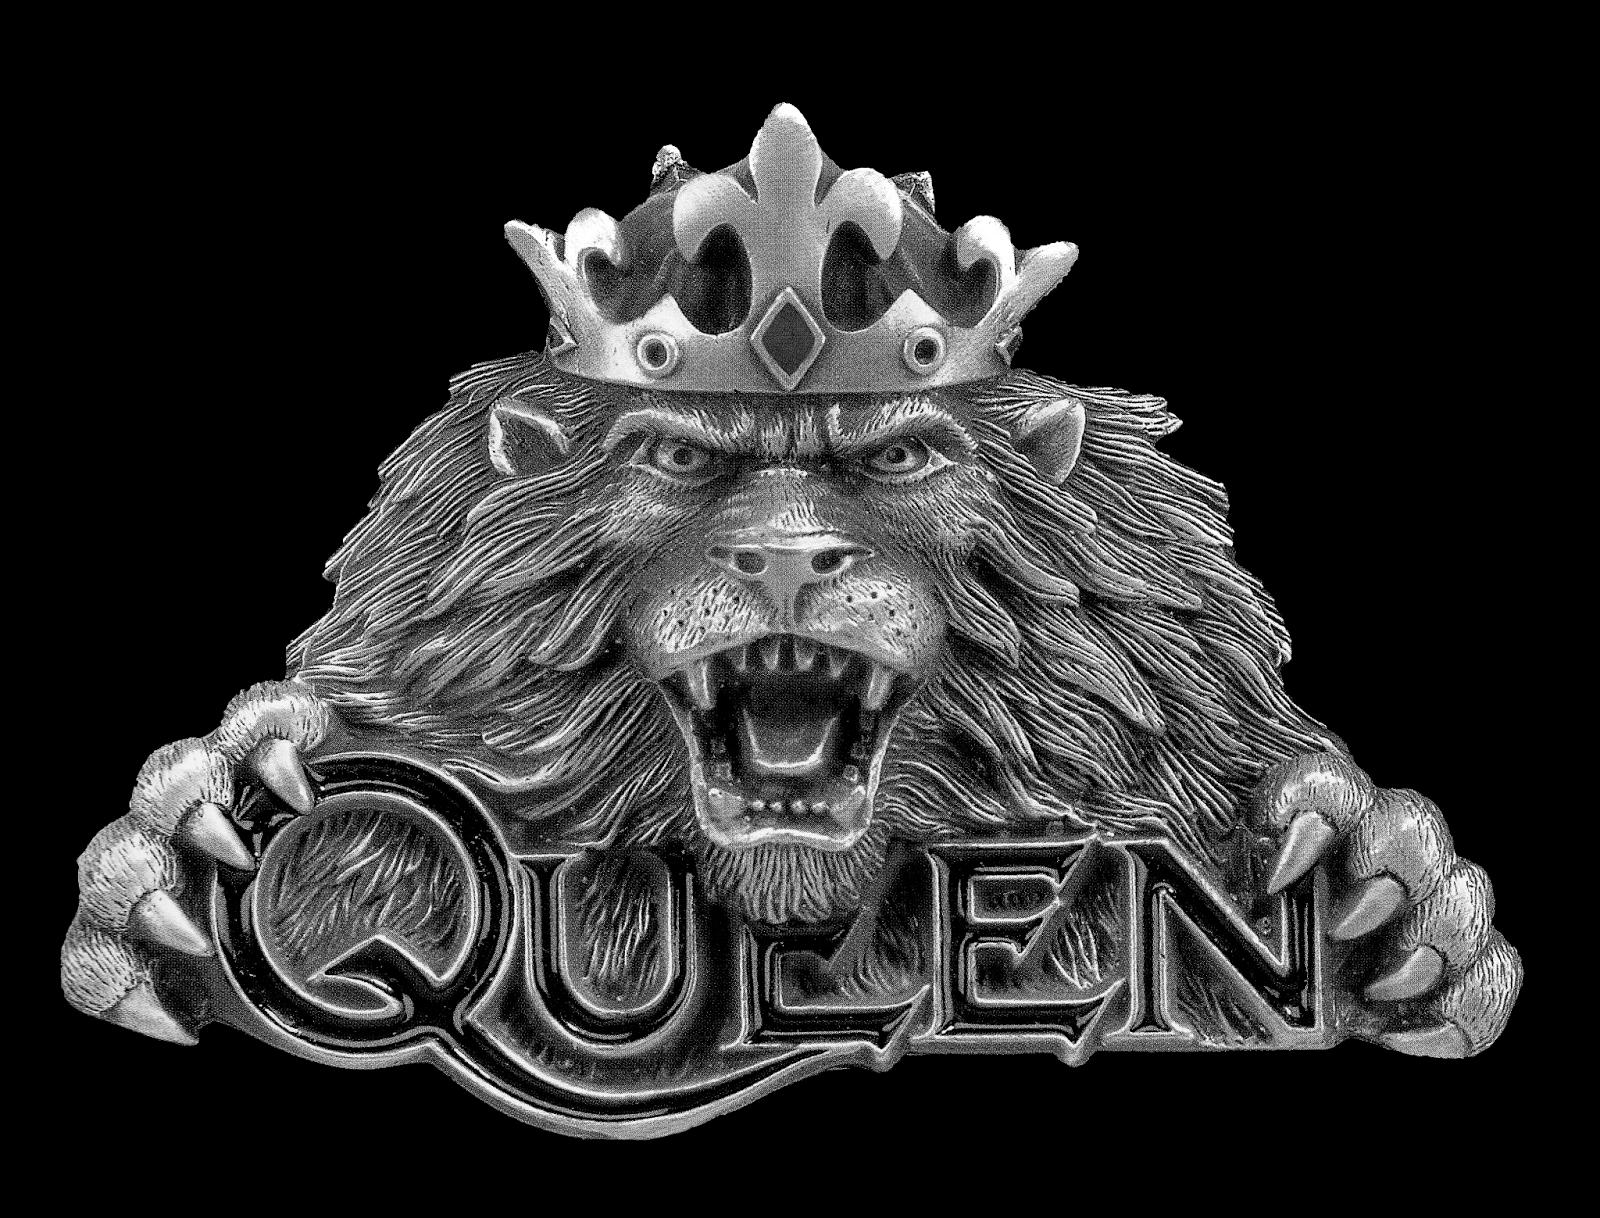 Queen - Sun City (1985)